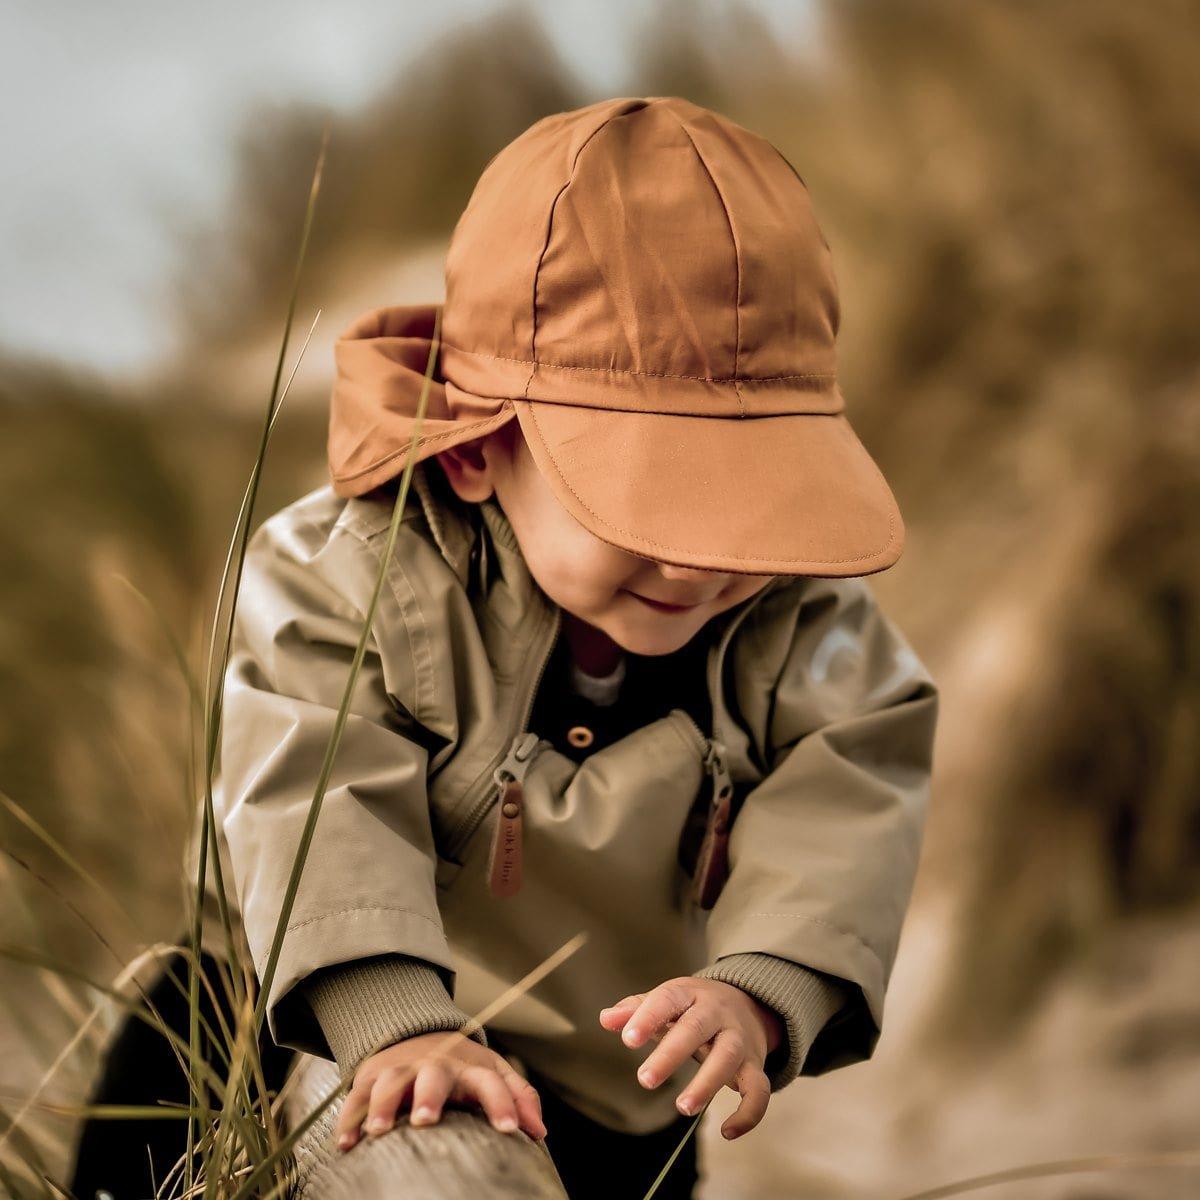 Pălărie de soare model pompier din bumbac UV 50+ Golden Brown Mikk-Line 2